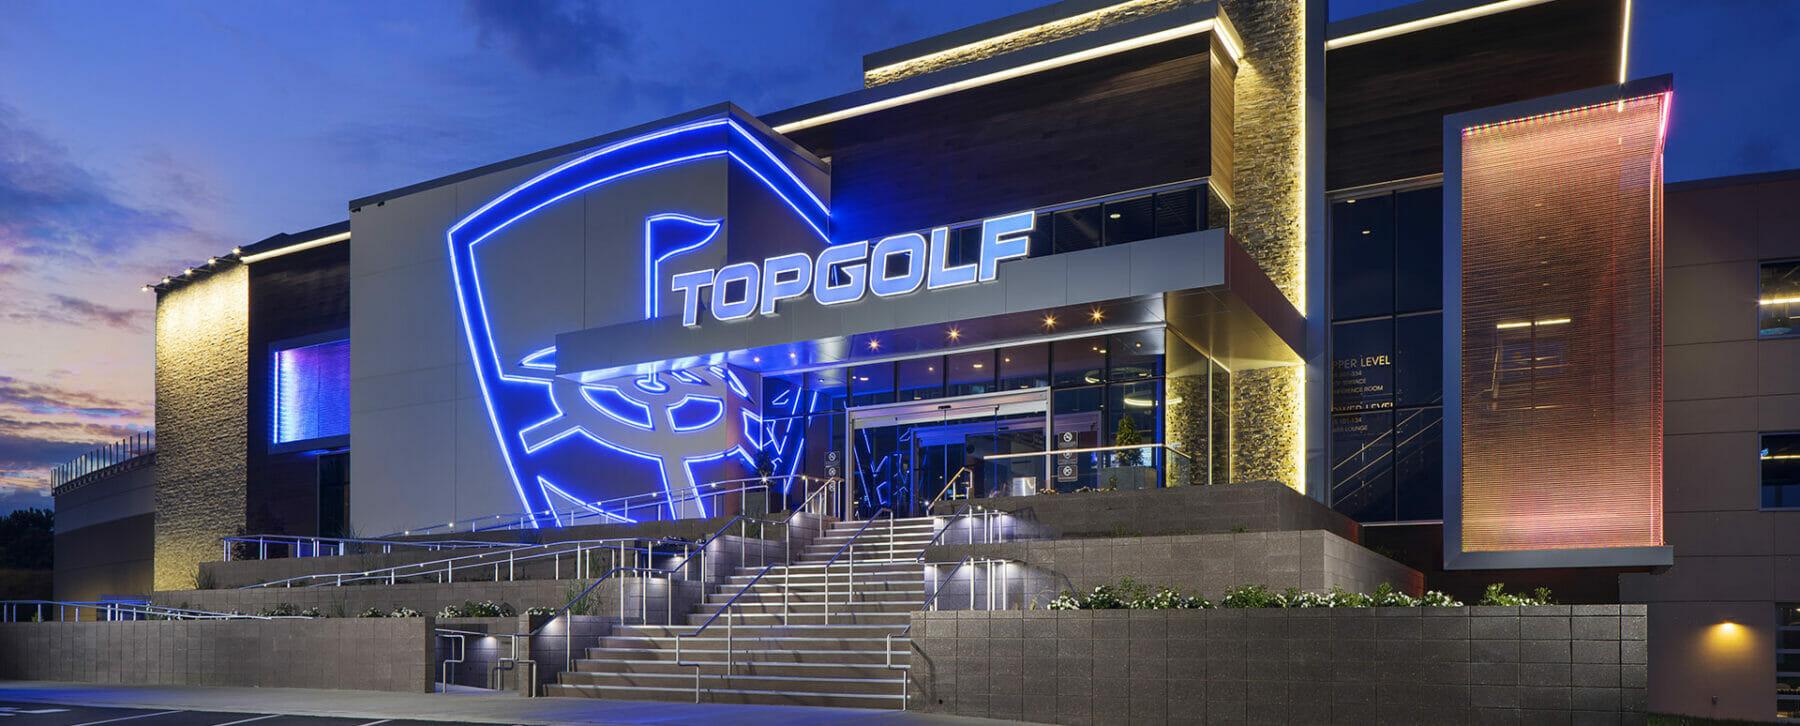 TopGolf - Charlotte, NC